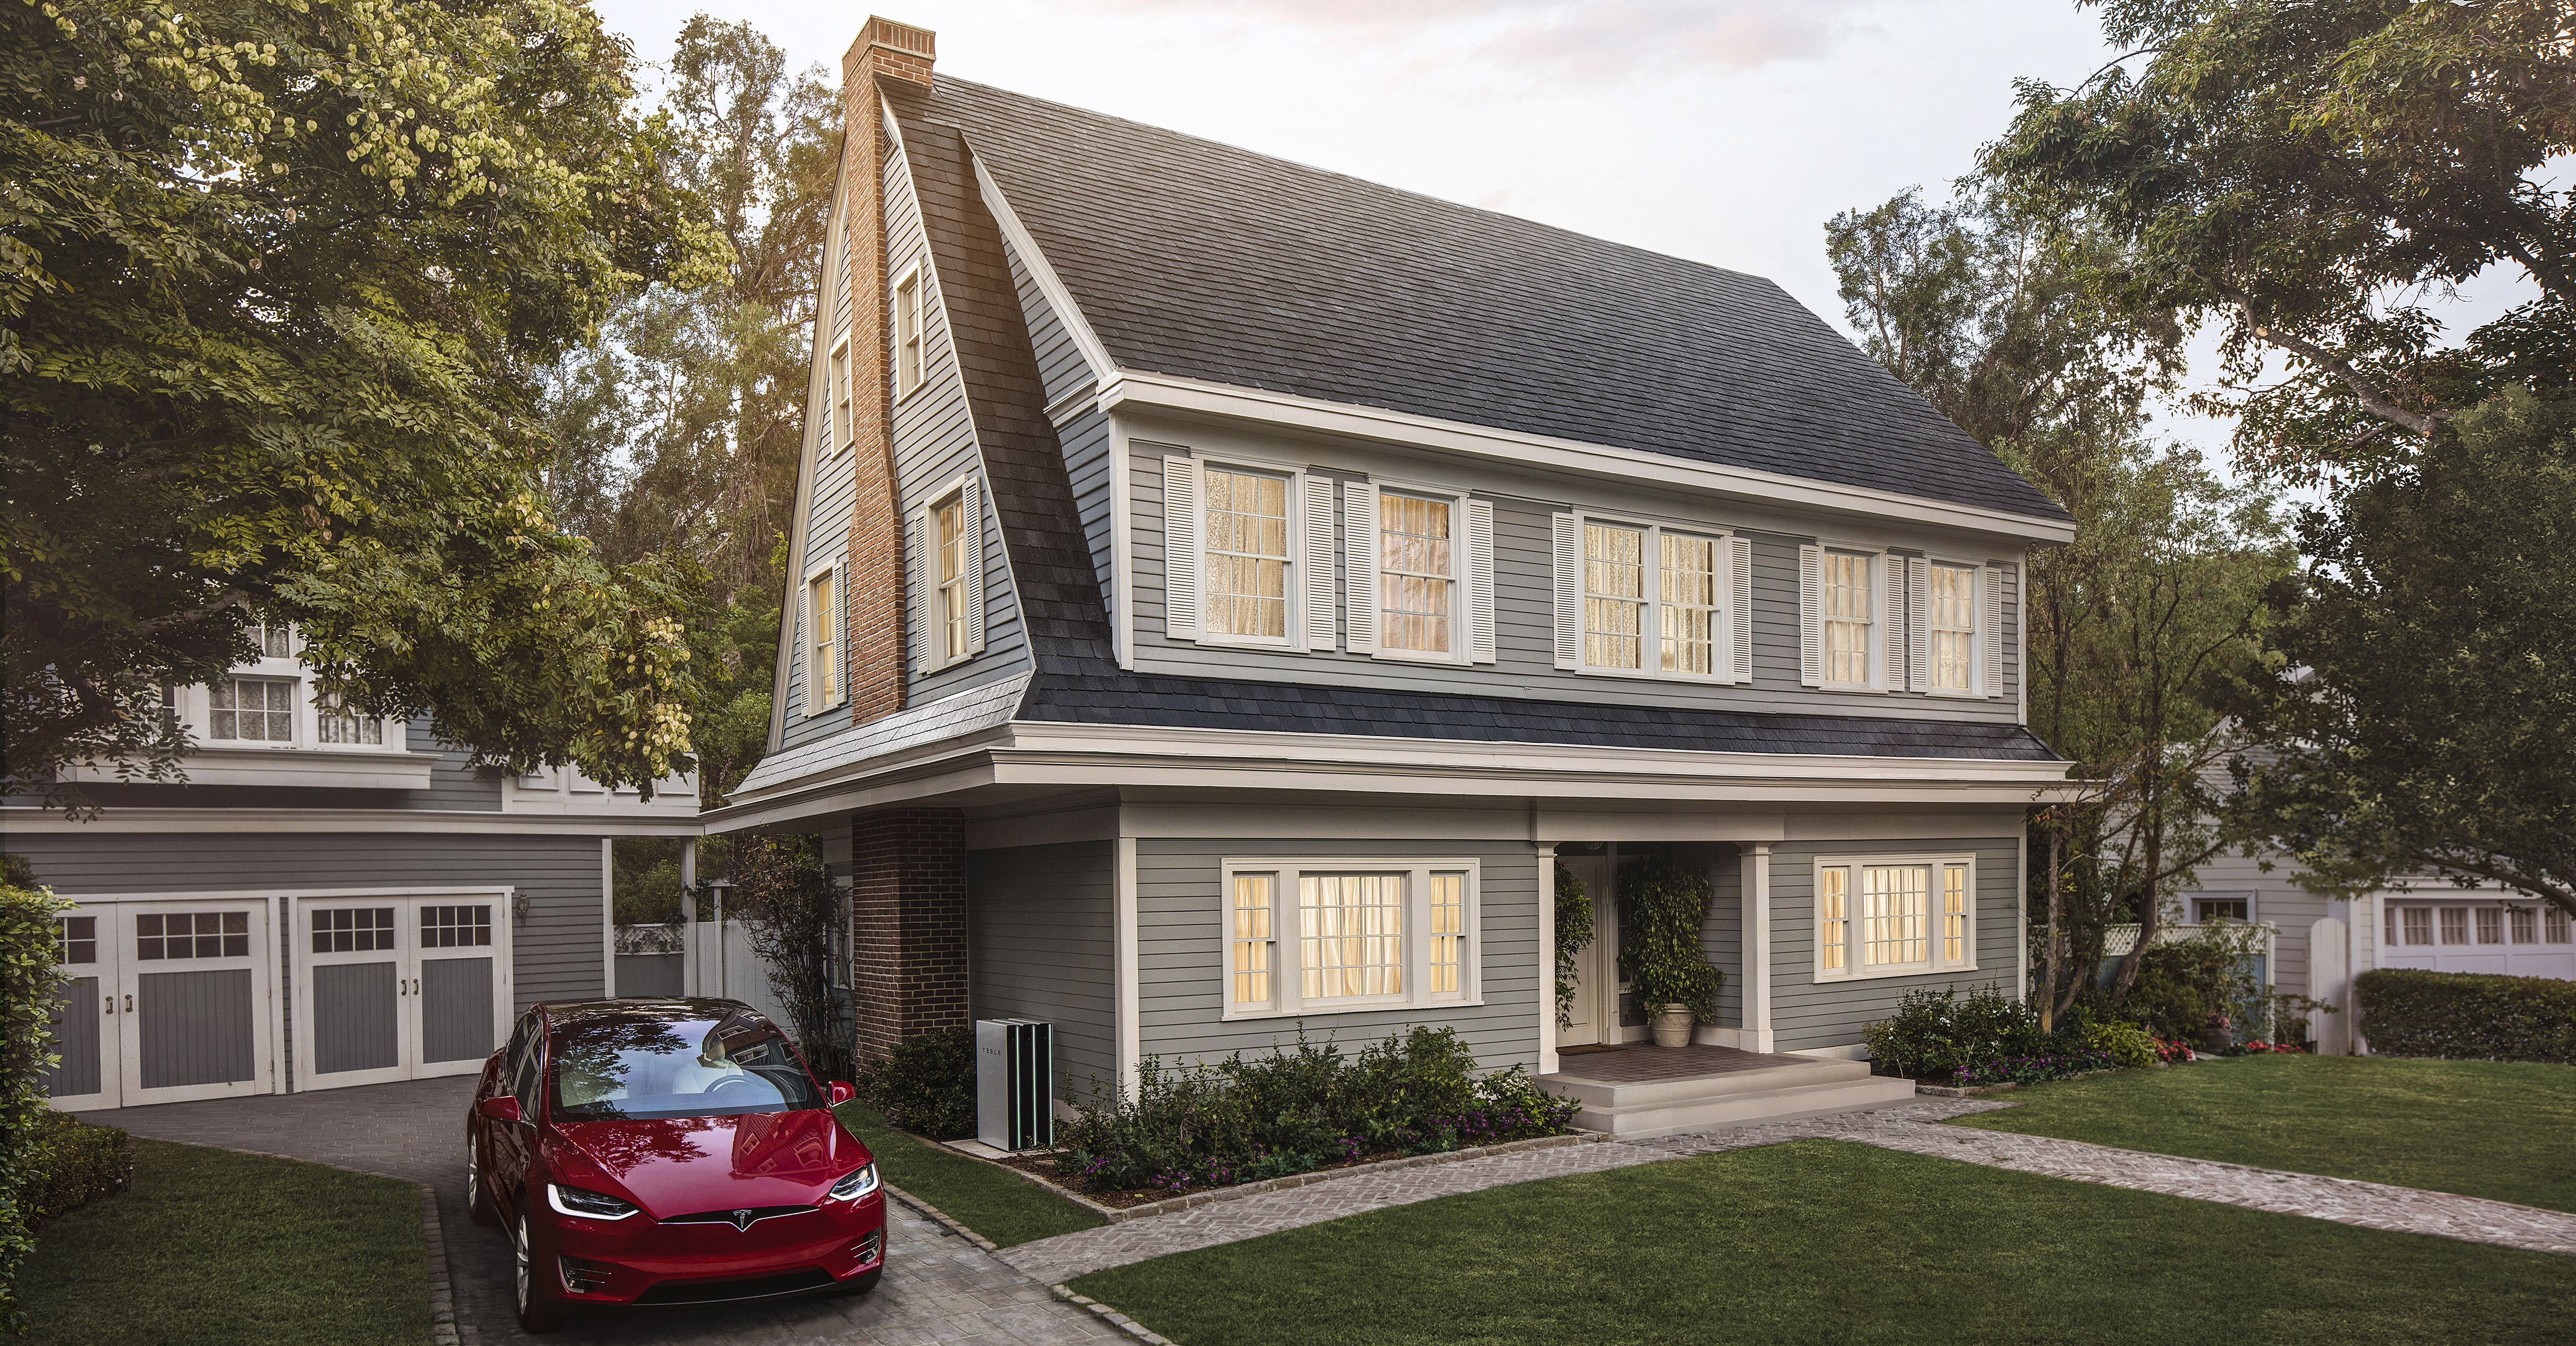 tesla nimmt vorbestellungen f r solar dachziegel entgegen. Black Bedroom Furniture Sets. Home Design Ideas